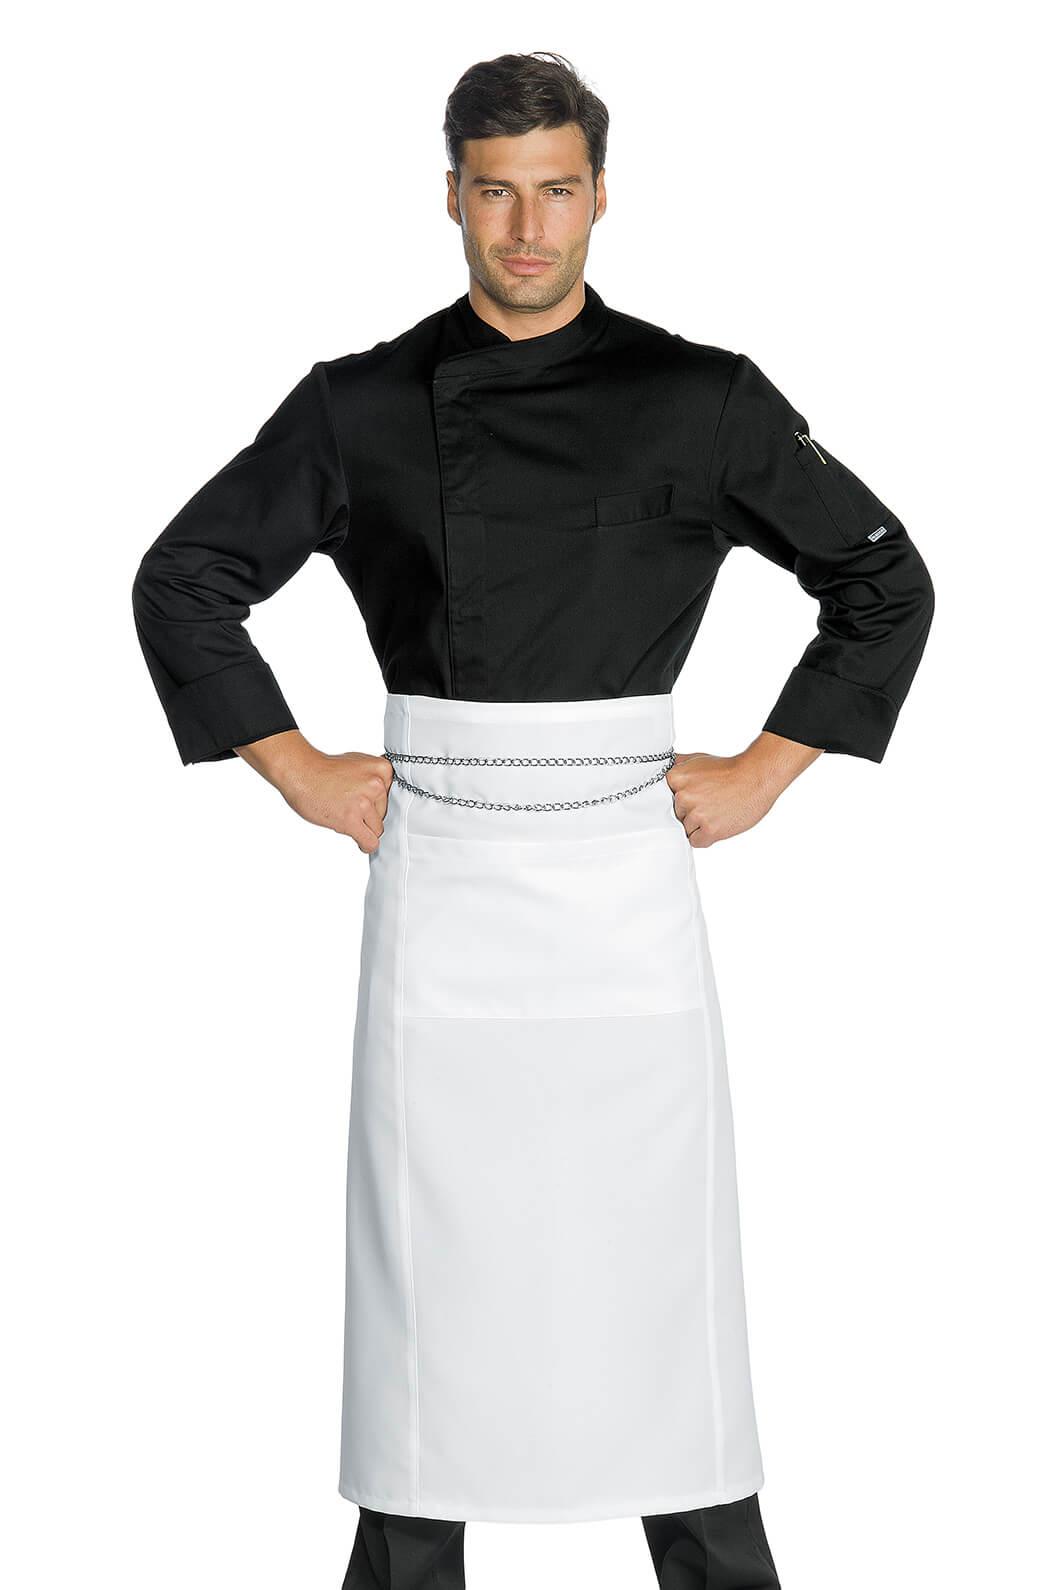 Veste chef cuisinier suzuka microfibres super dry noir for Cuisinier 71